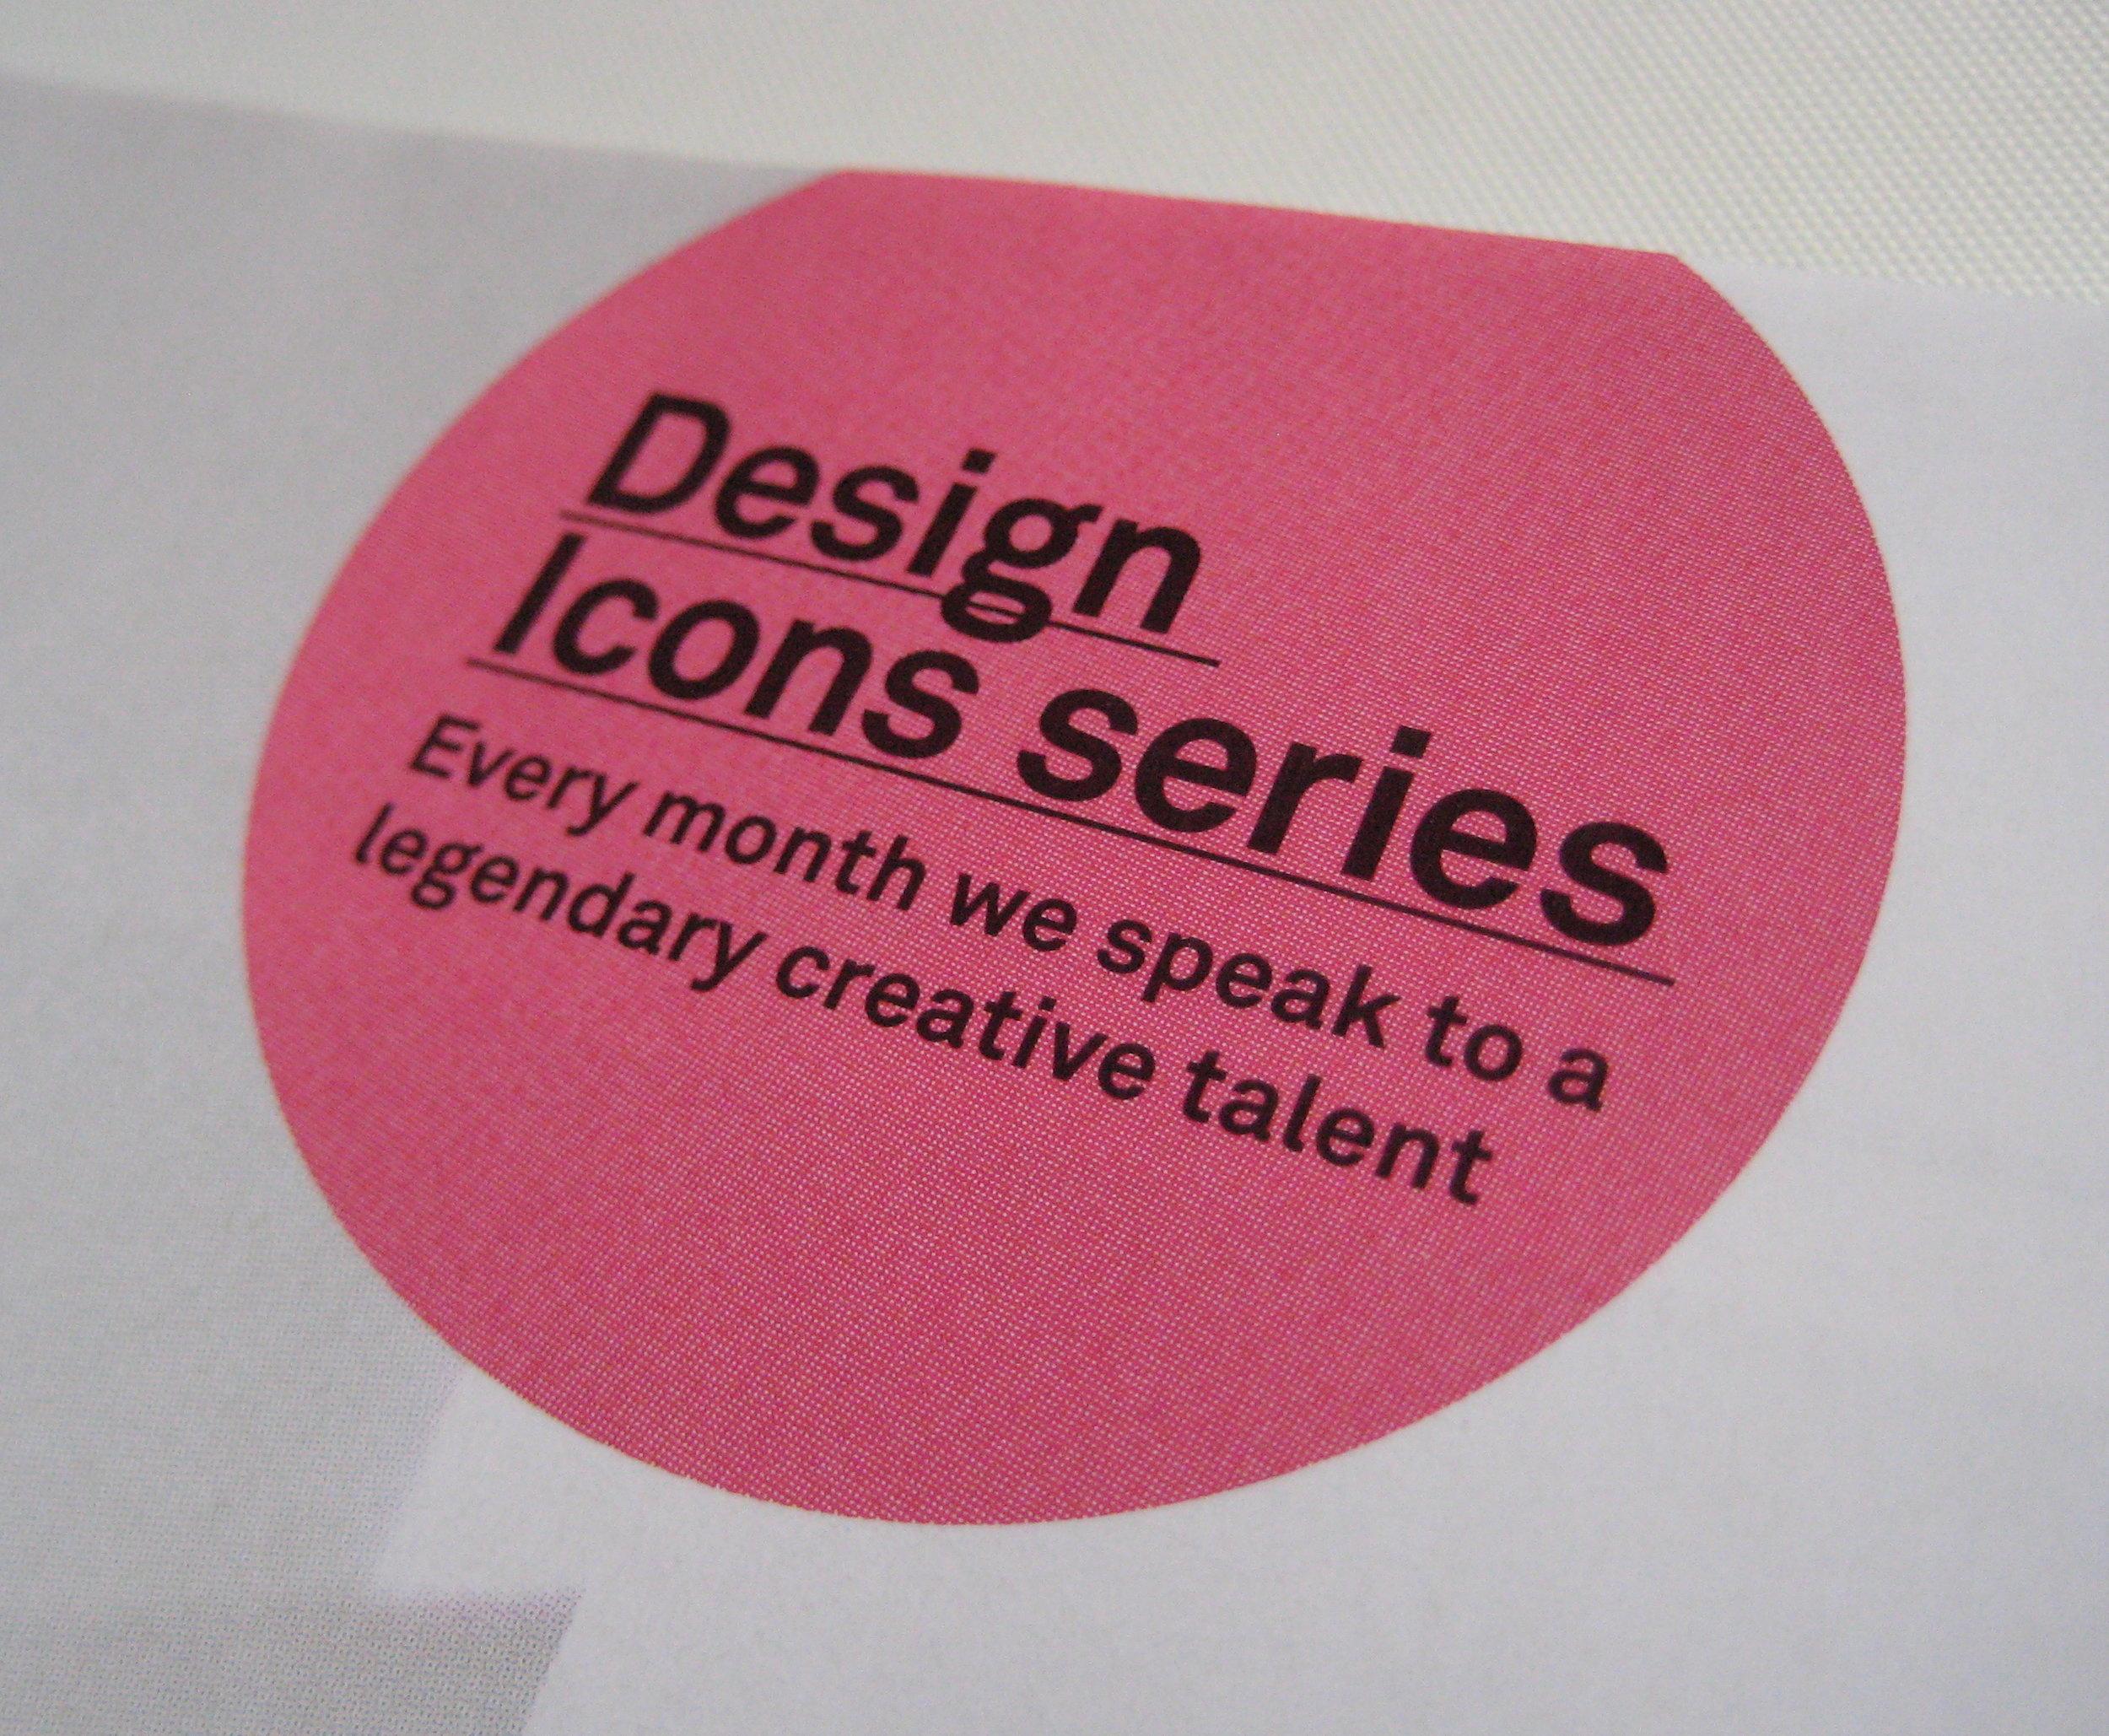 design icons_computer arts_2008_1.JPG